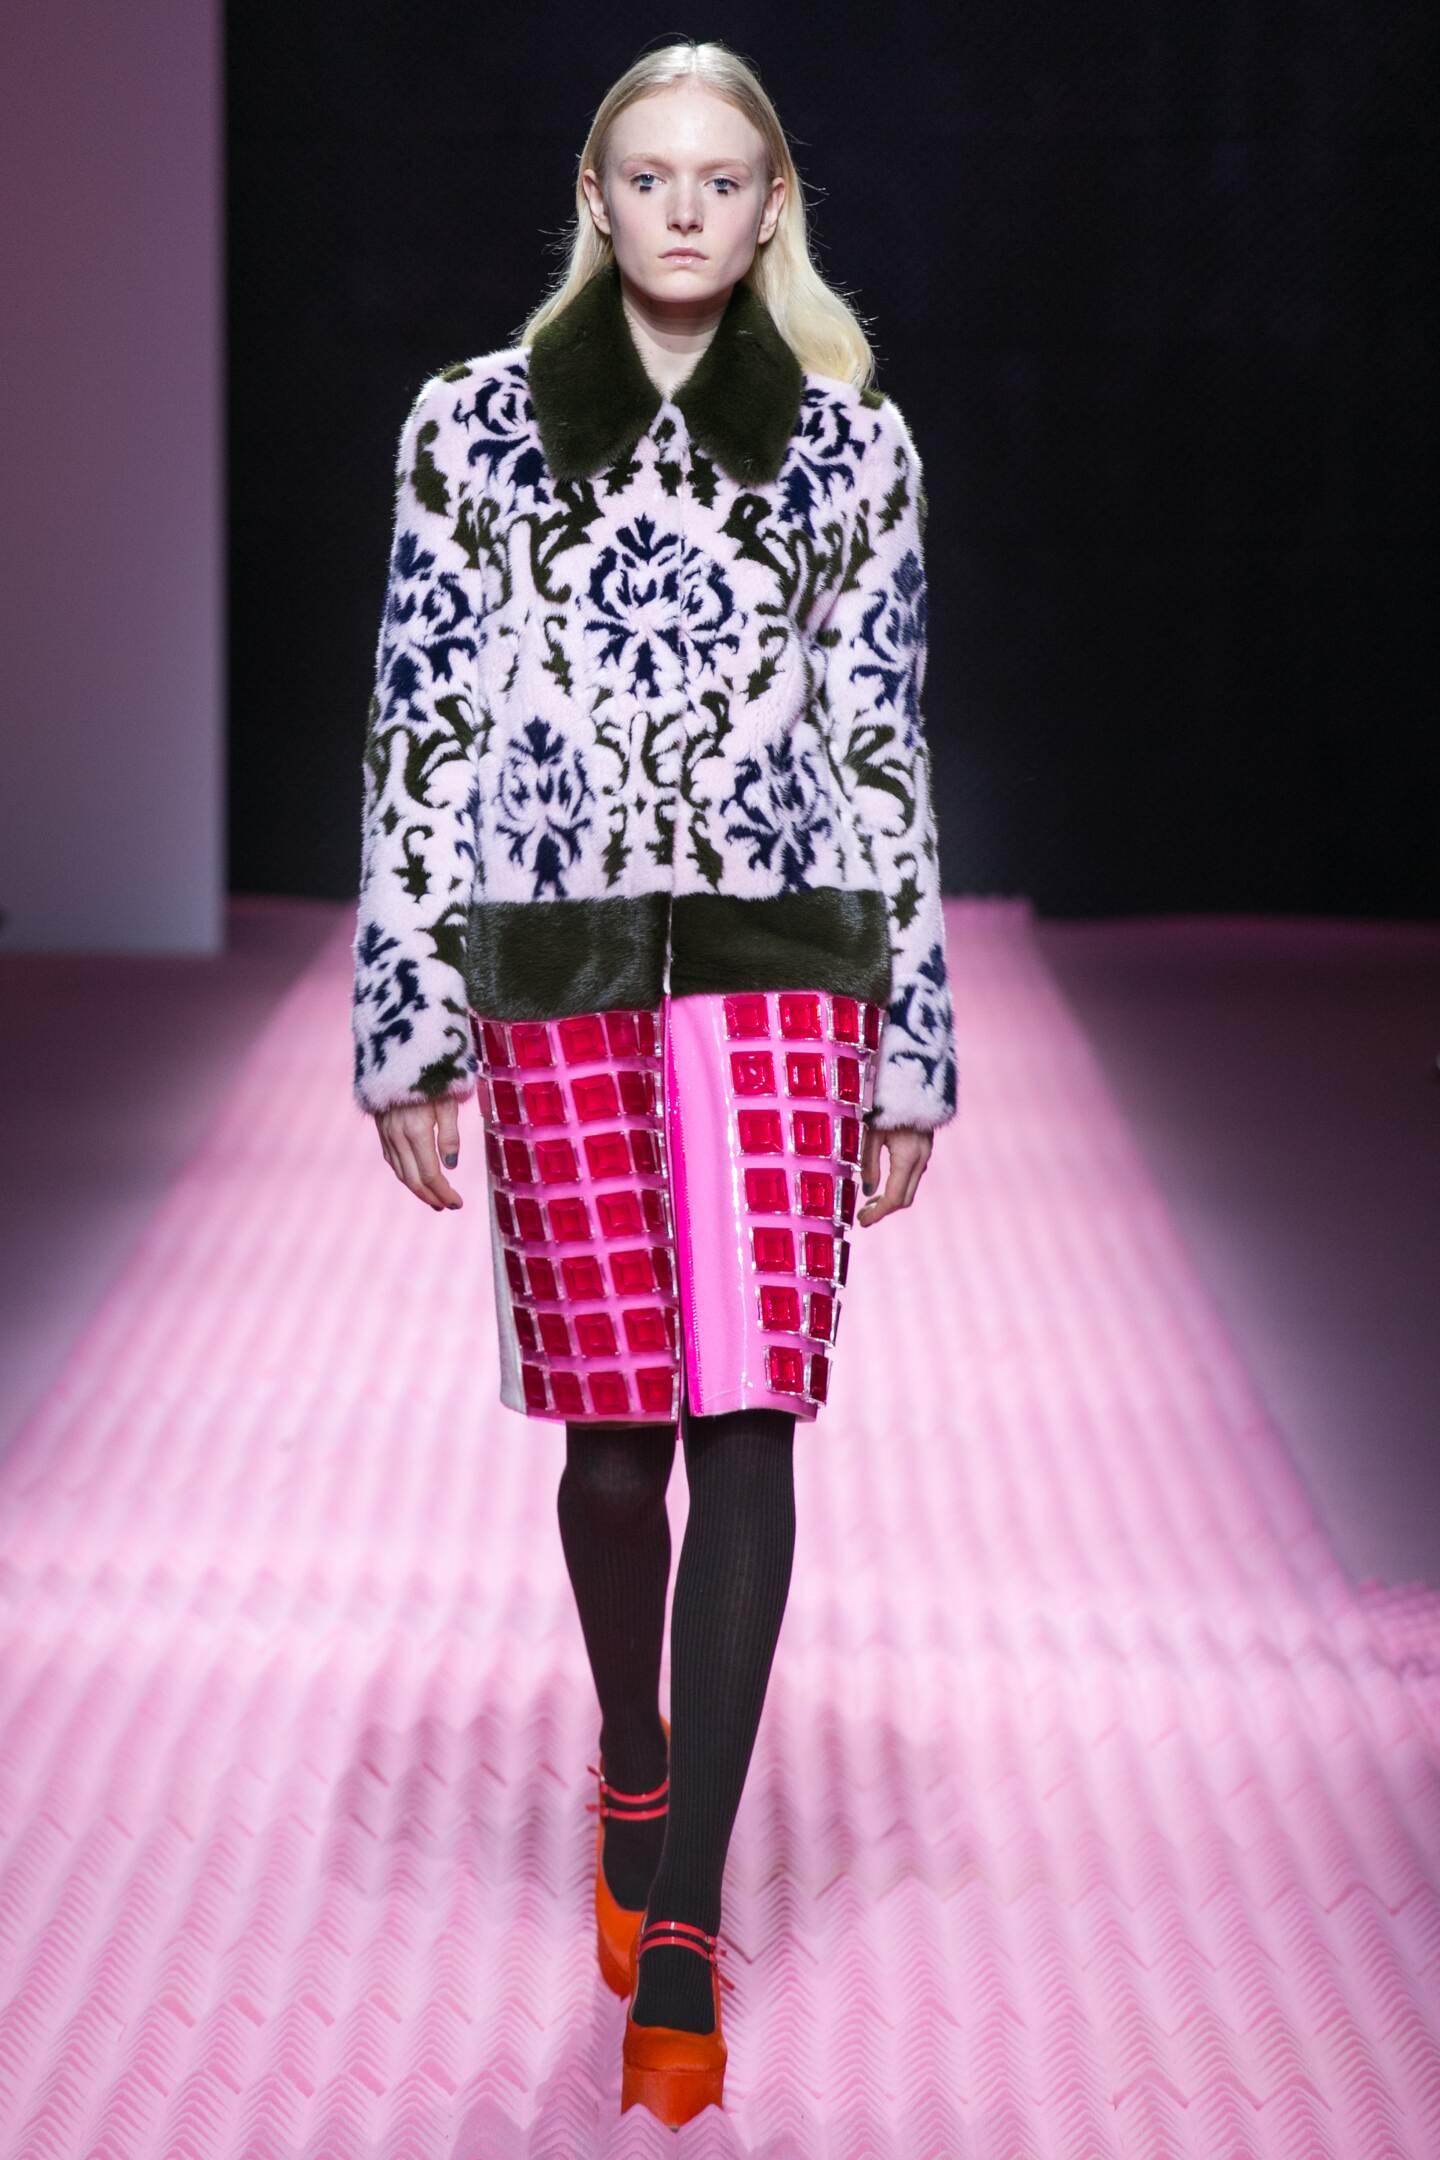 Runway Mary Katrantzou Fall Winter 2015 16 Women's Collection London Fashion Week